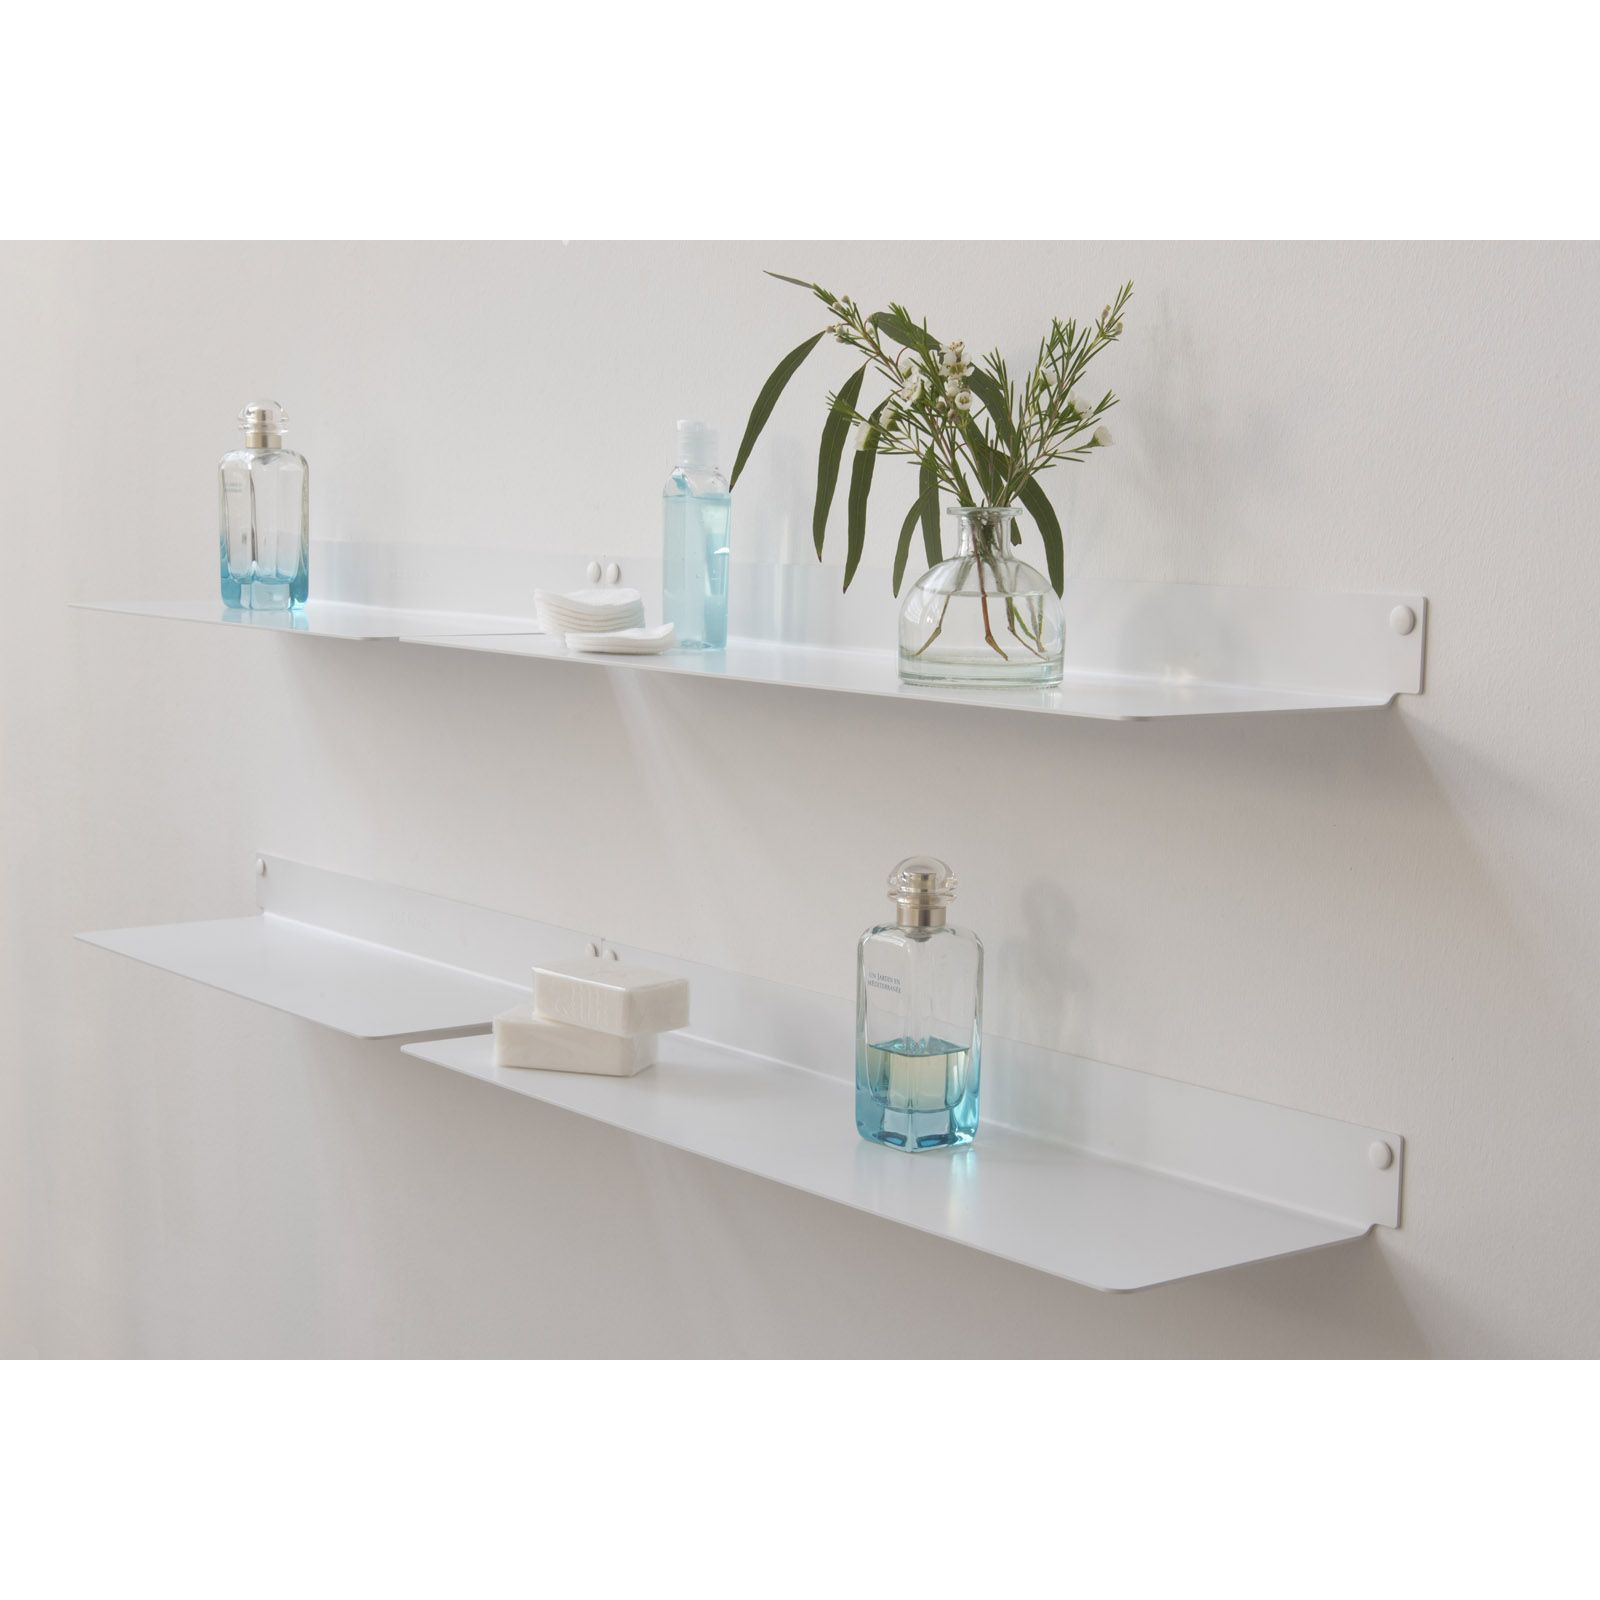 Bathroom shelves TEEline 6015 | Set of 4